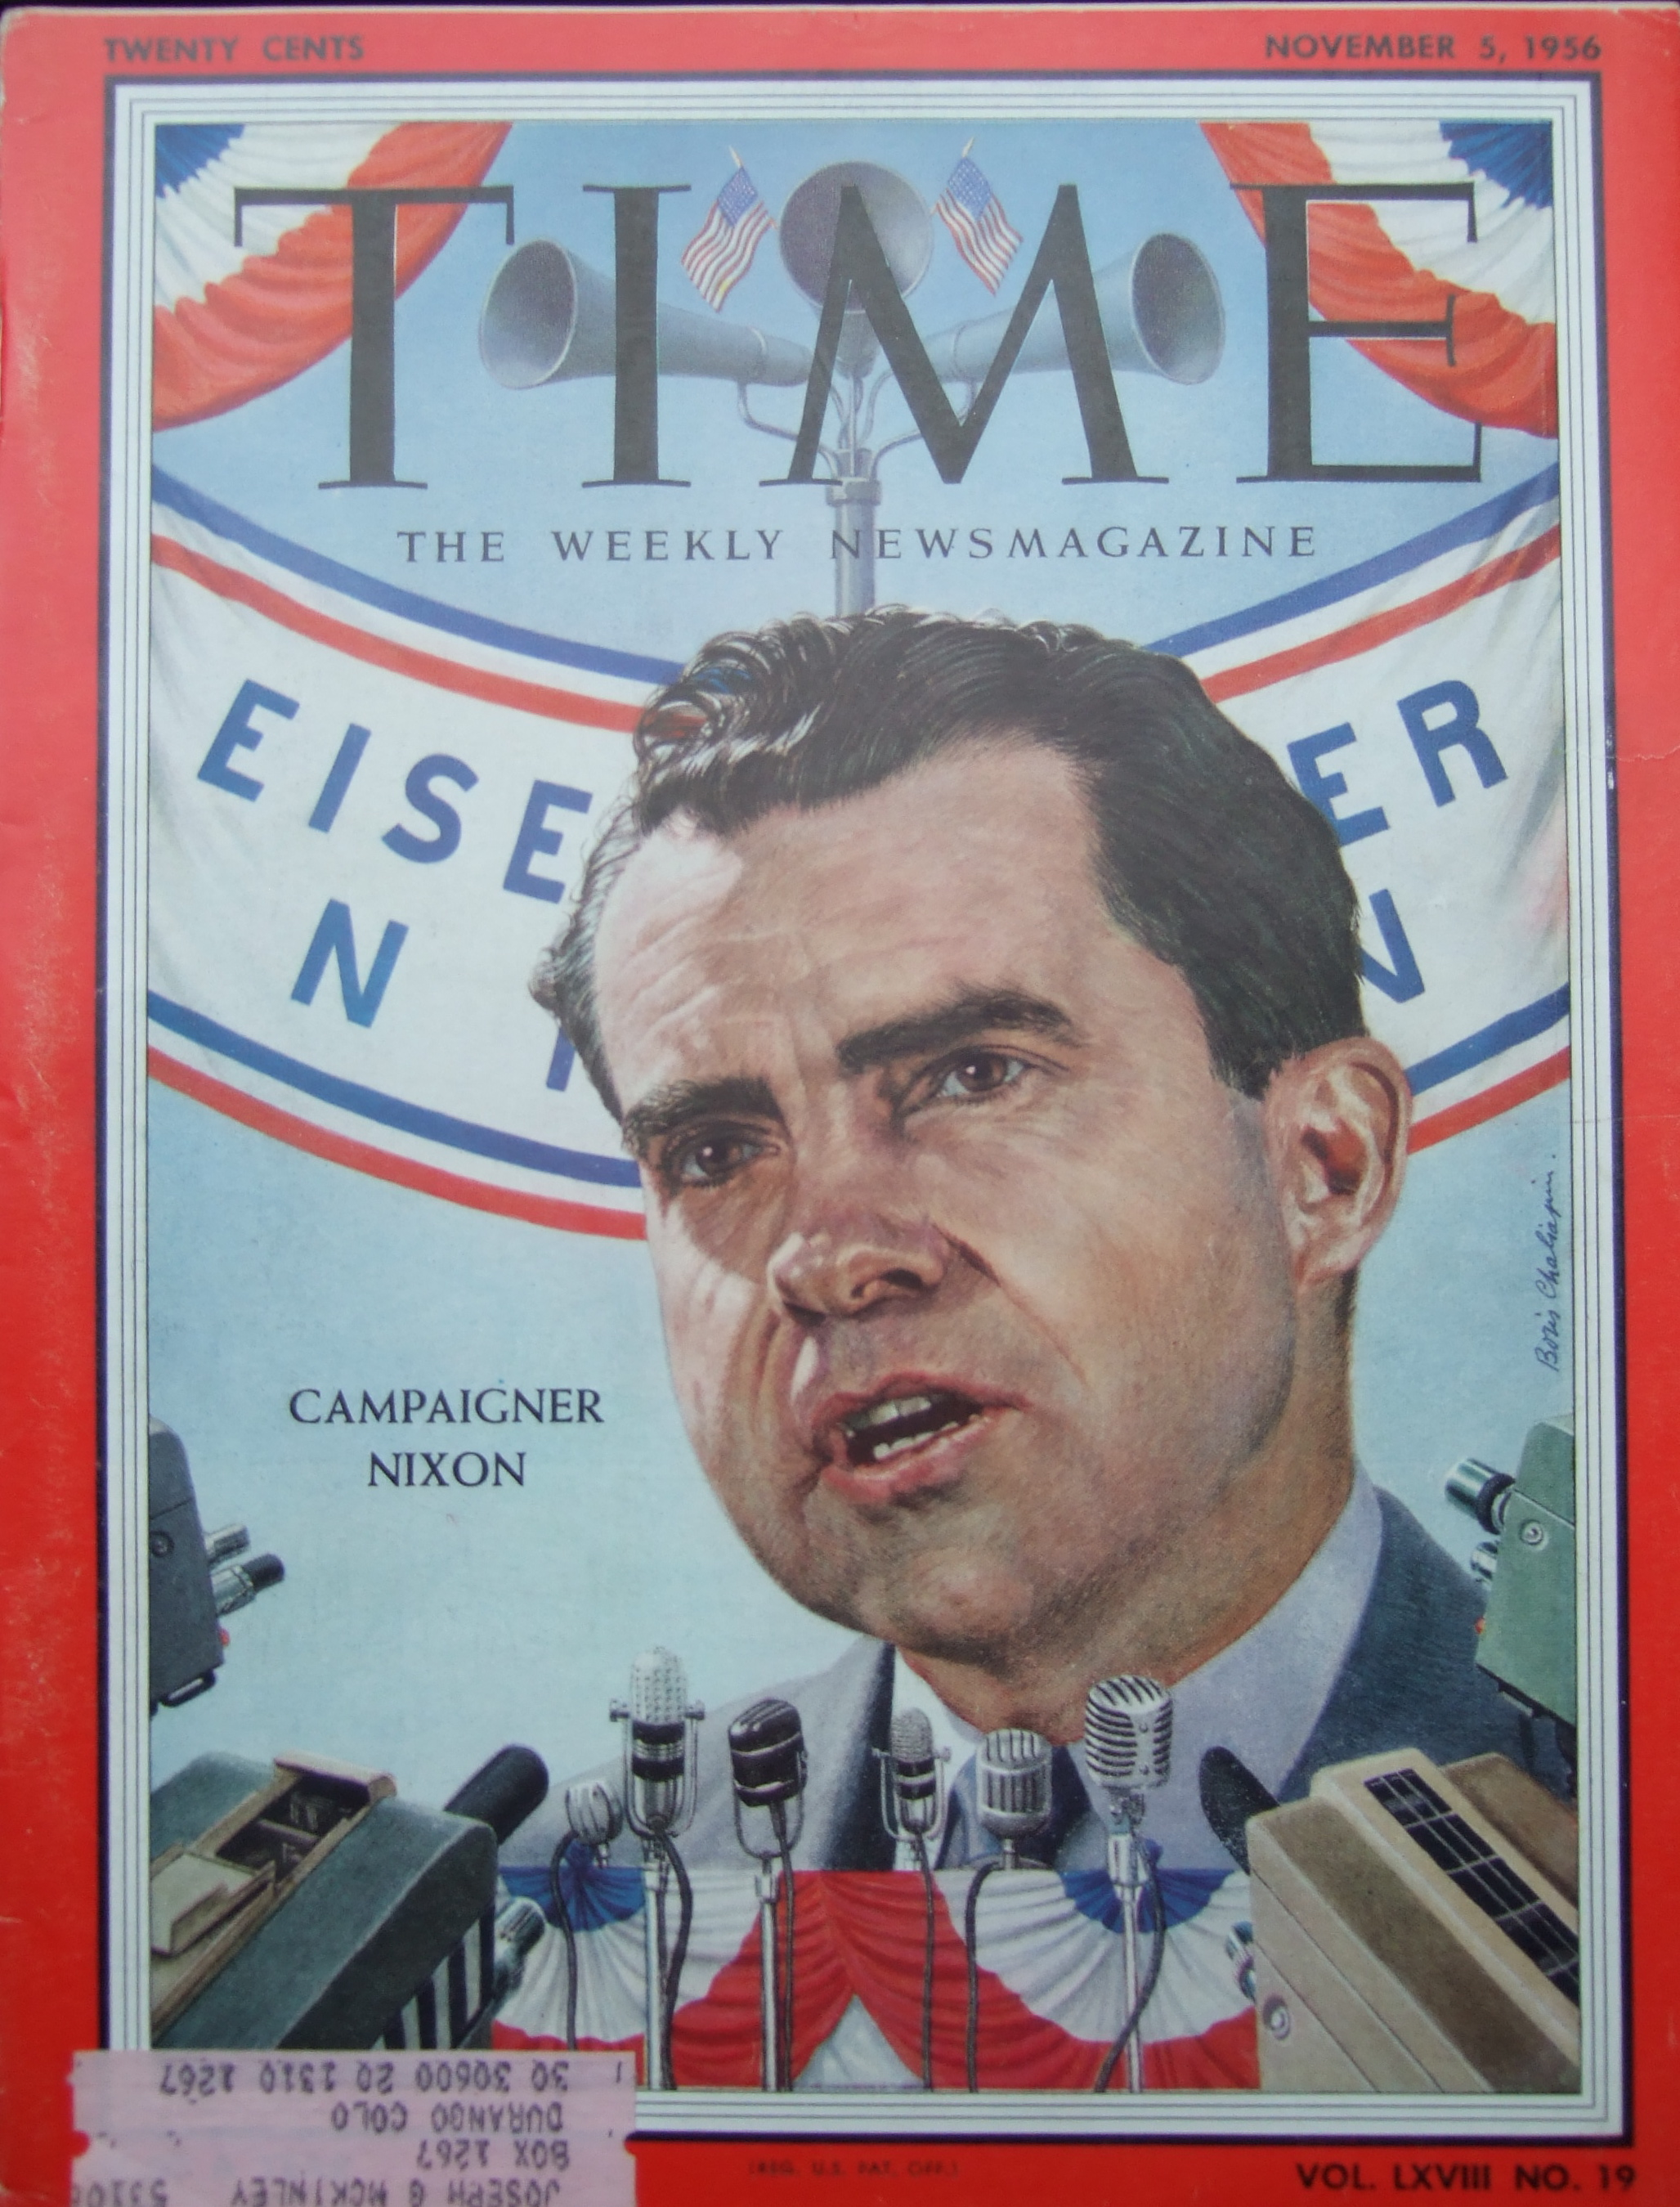 Magazine TIME November 1  956.  Cover by Boris Chaliapin.